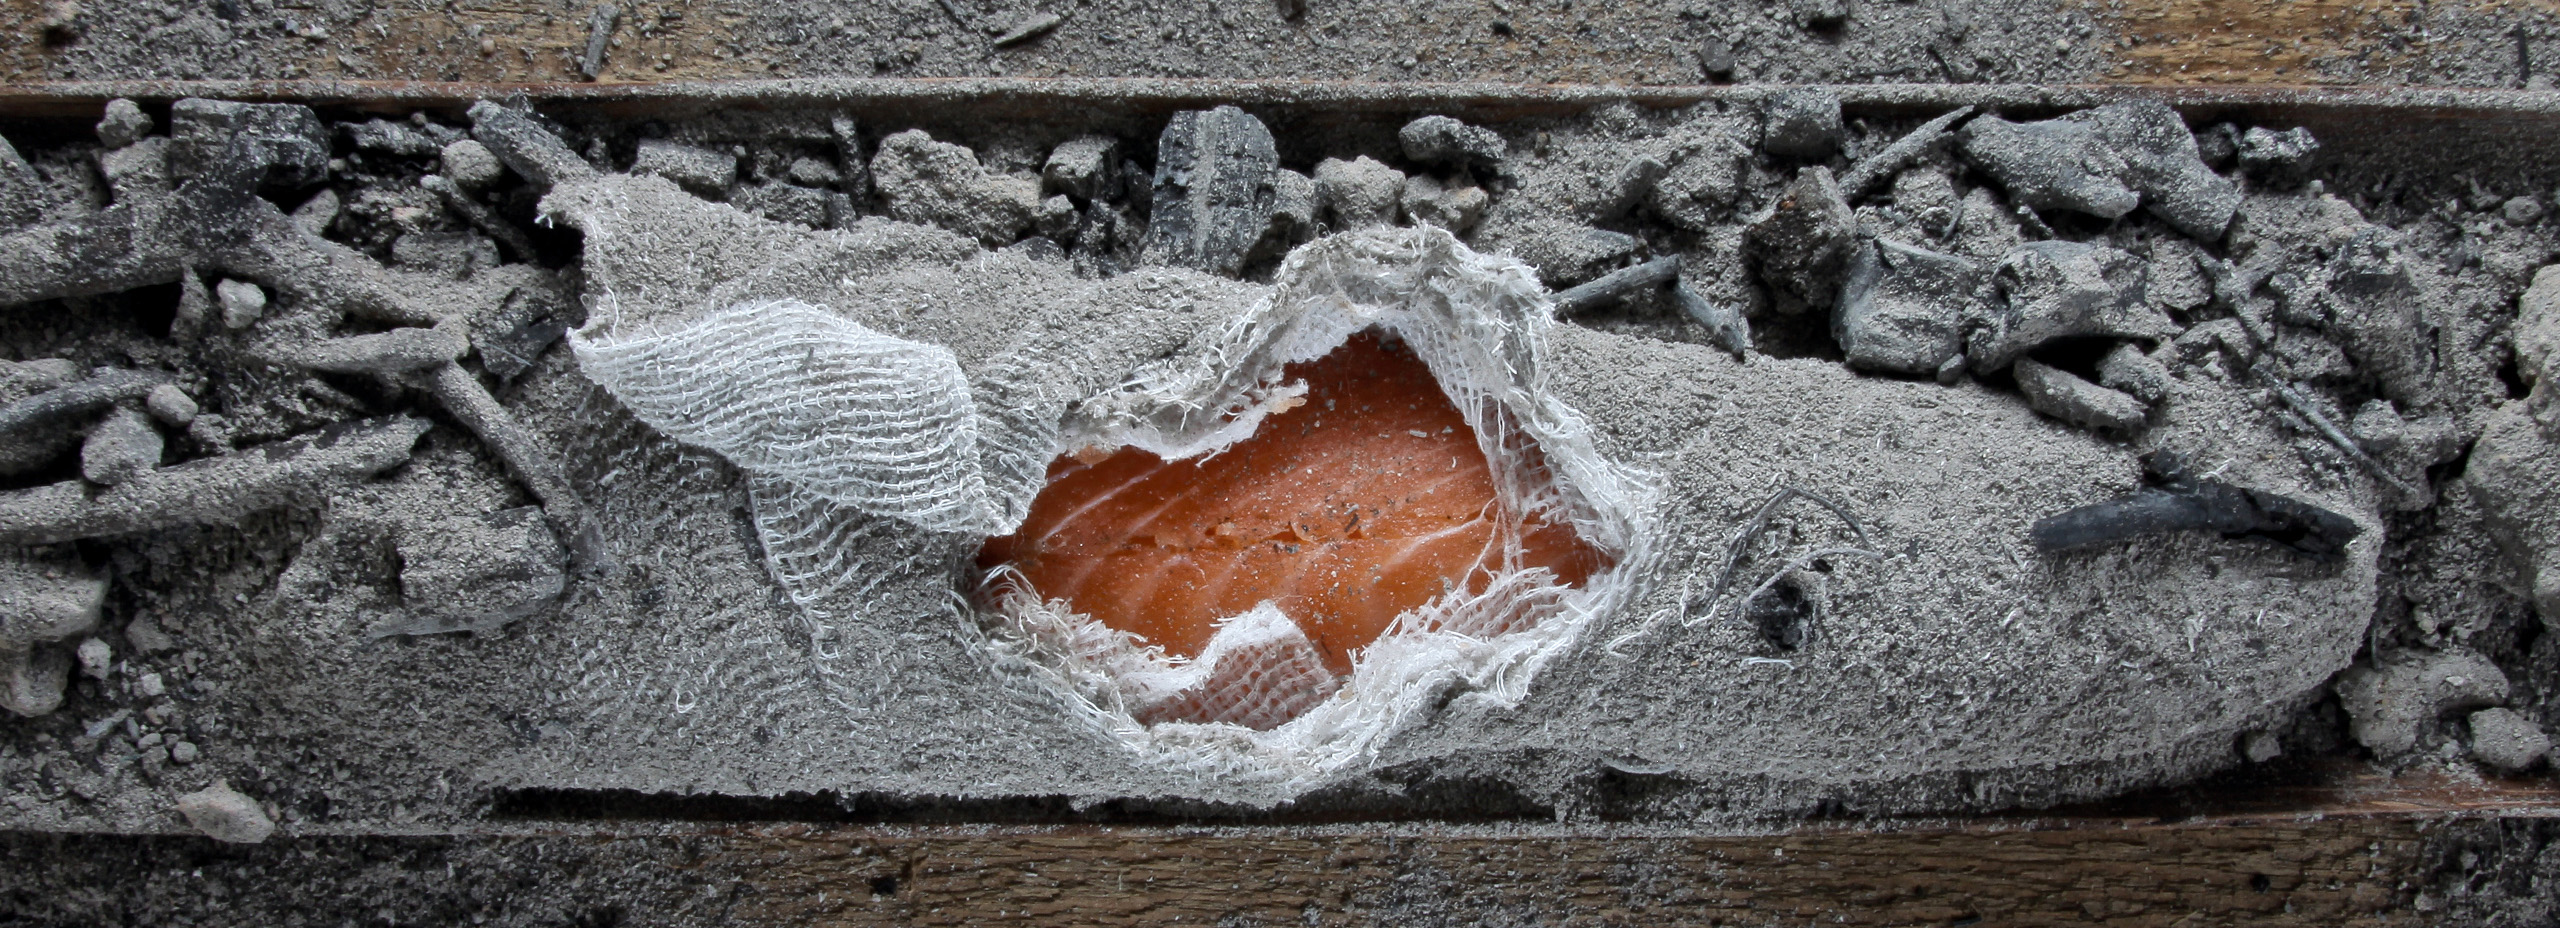 Lachs in Asche – Heiko Antoniewicz